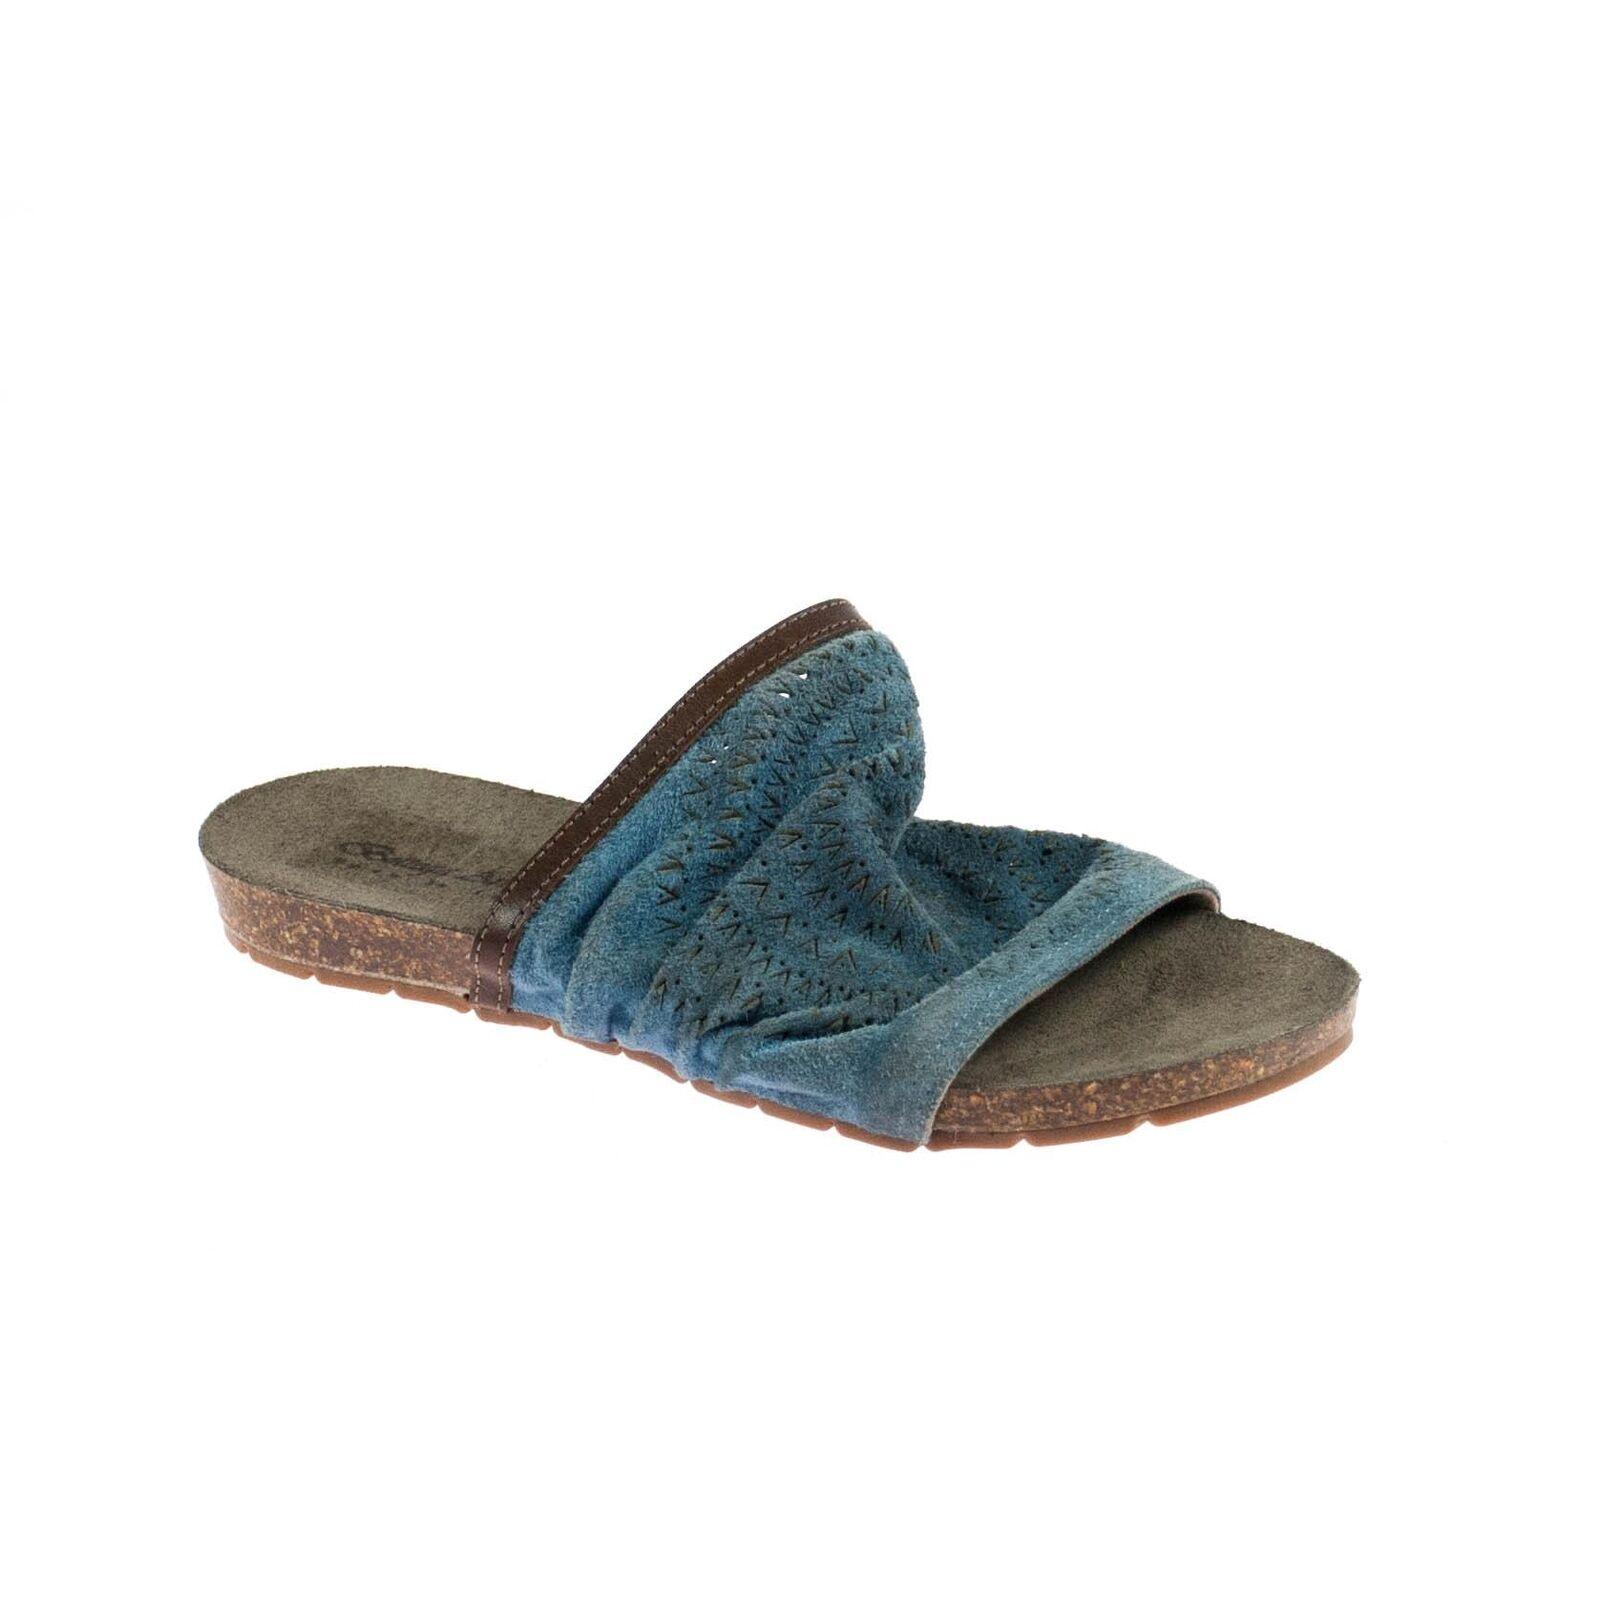 Bottega artigiana Femmes Sandale en cuir bleu